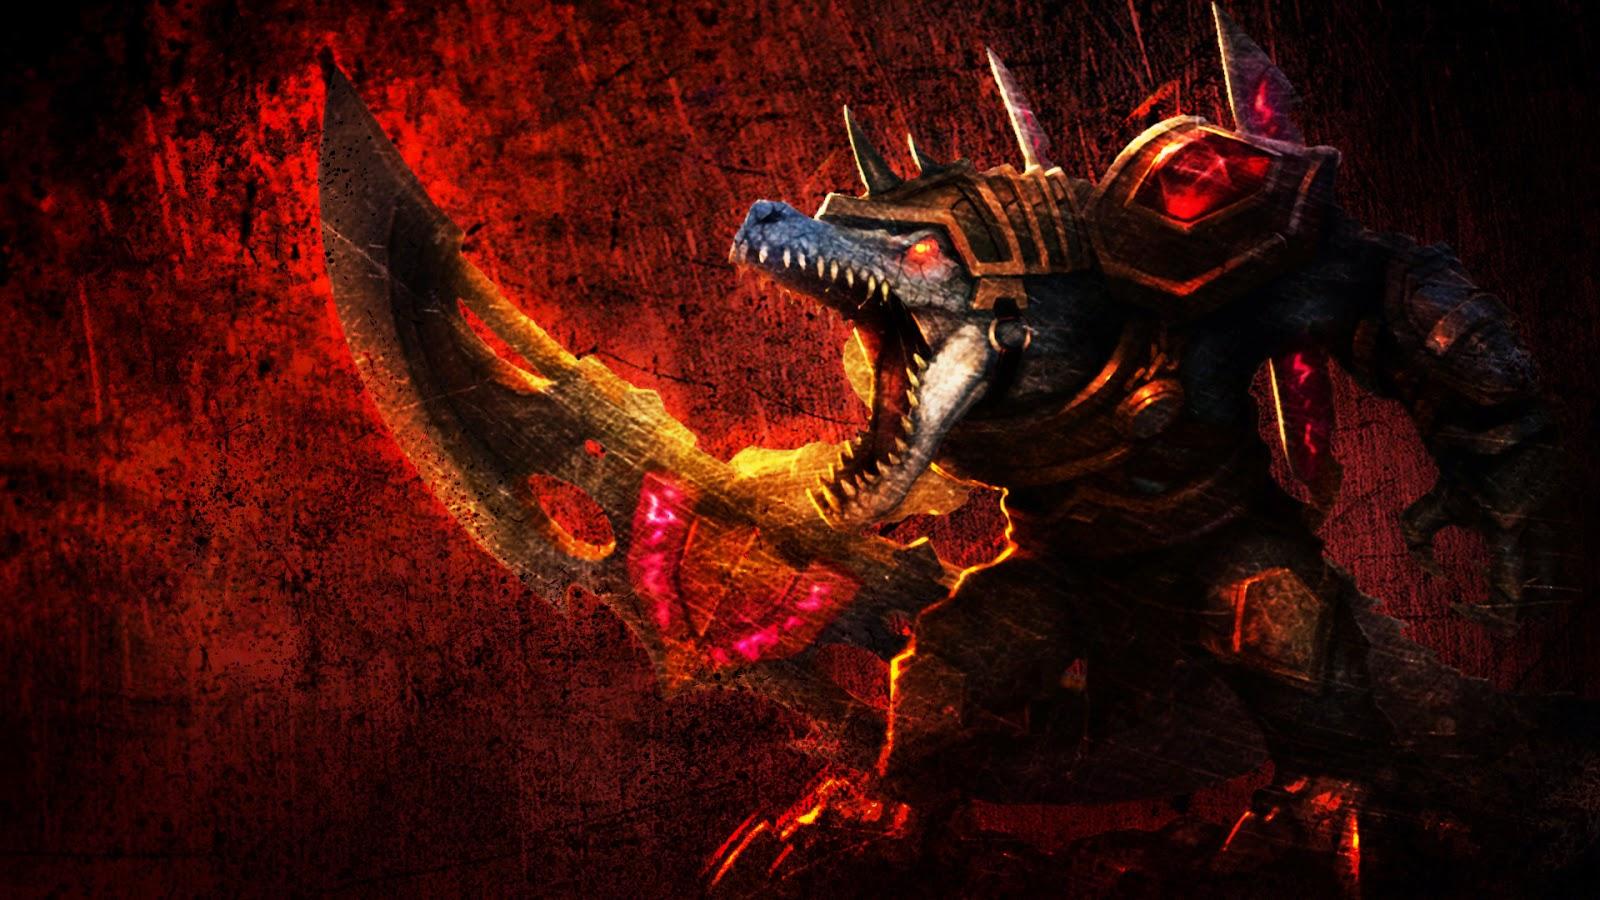 Renekton League of Legends Wallpaper, Renekton Desktop Wallpaper